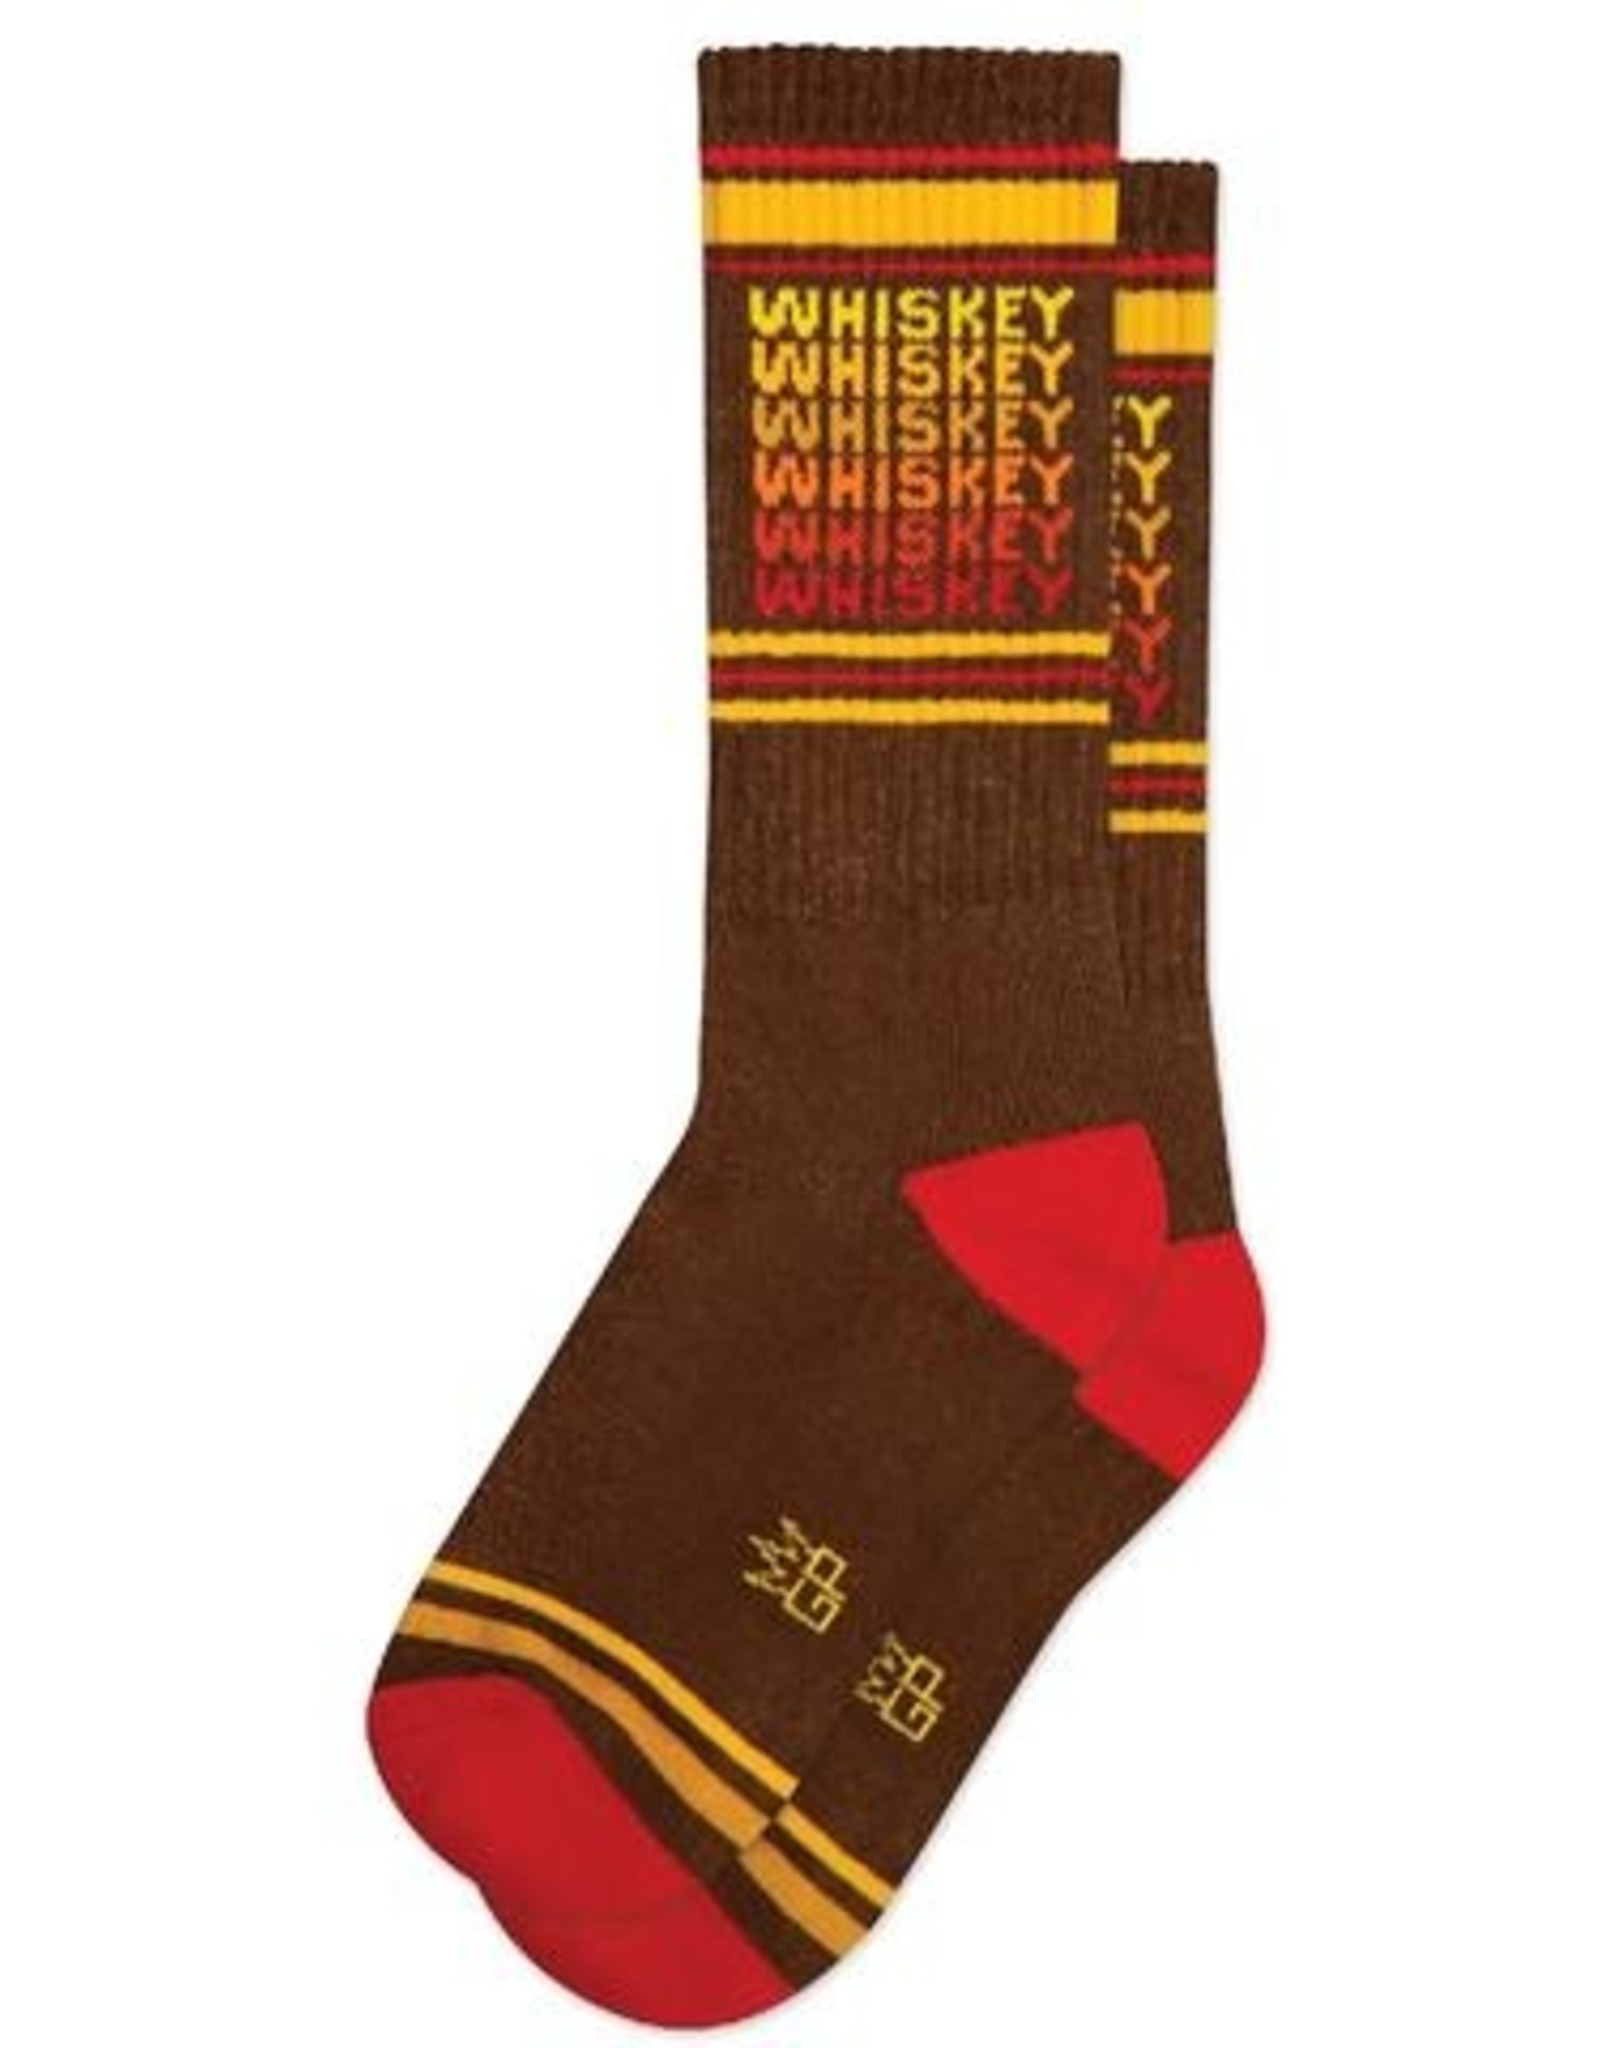 Gumball Poodle Athletic Socks: Whiskey